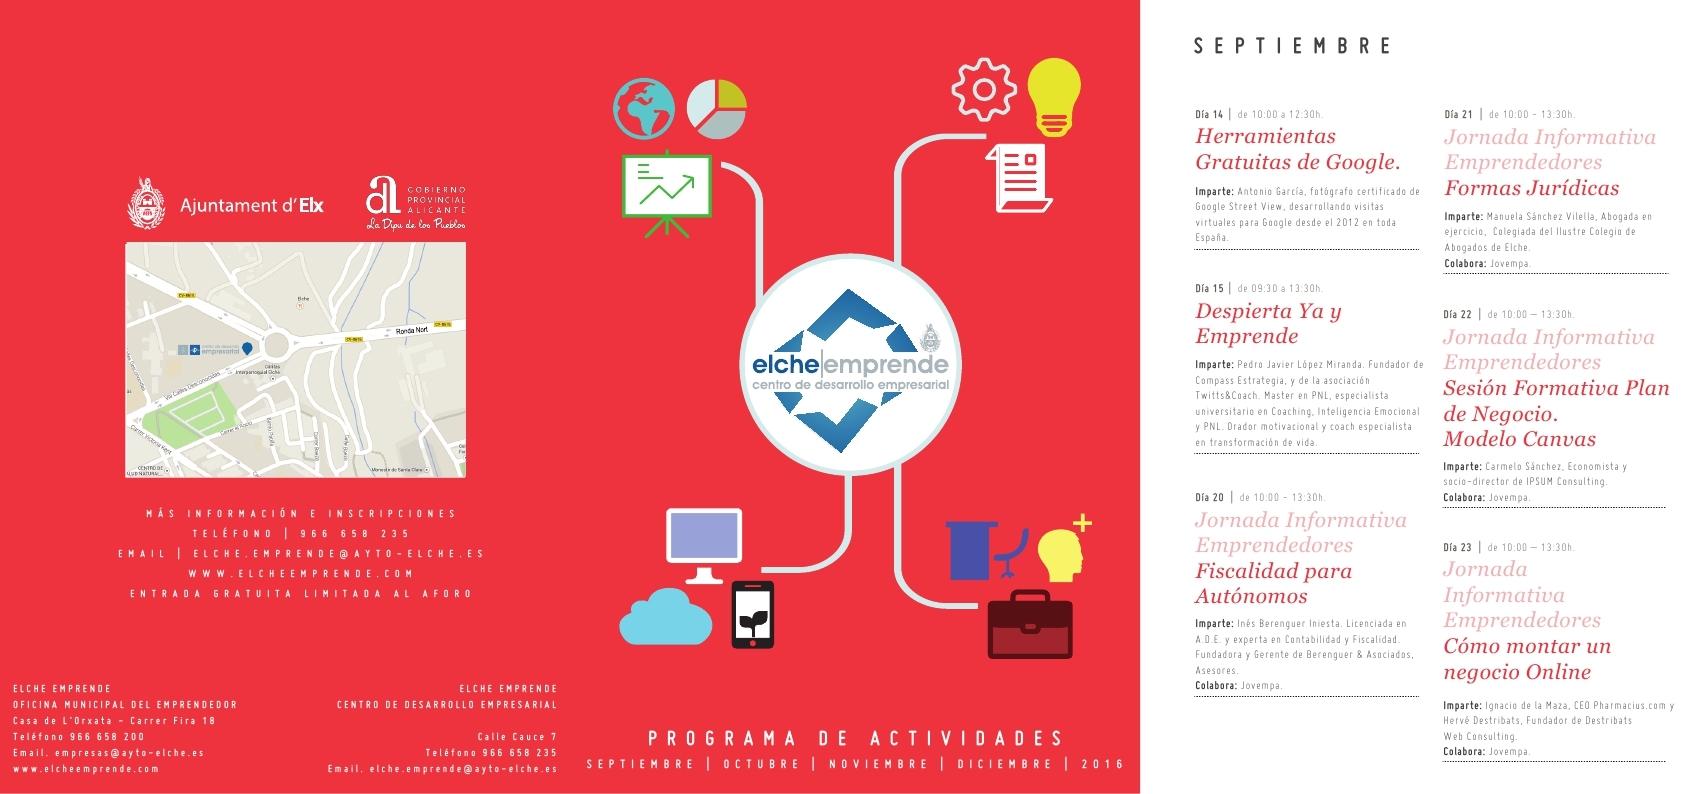 folleto_ultimo_cuatrimestre (2).pdf_page_1